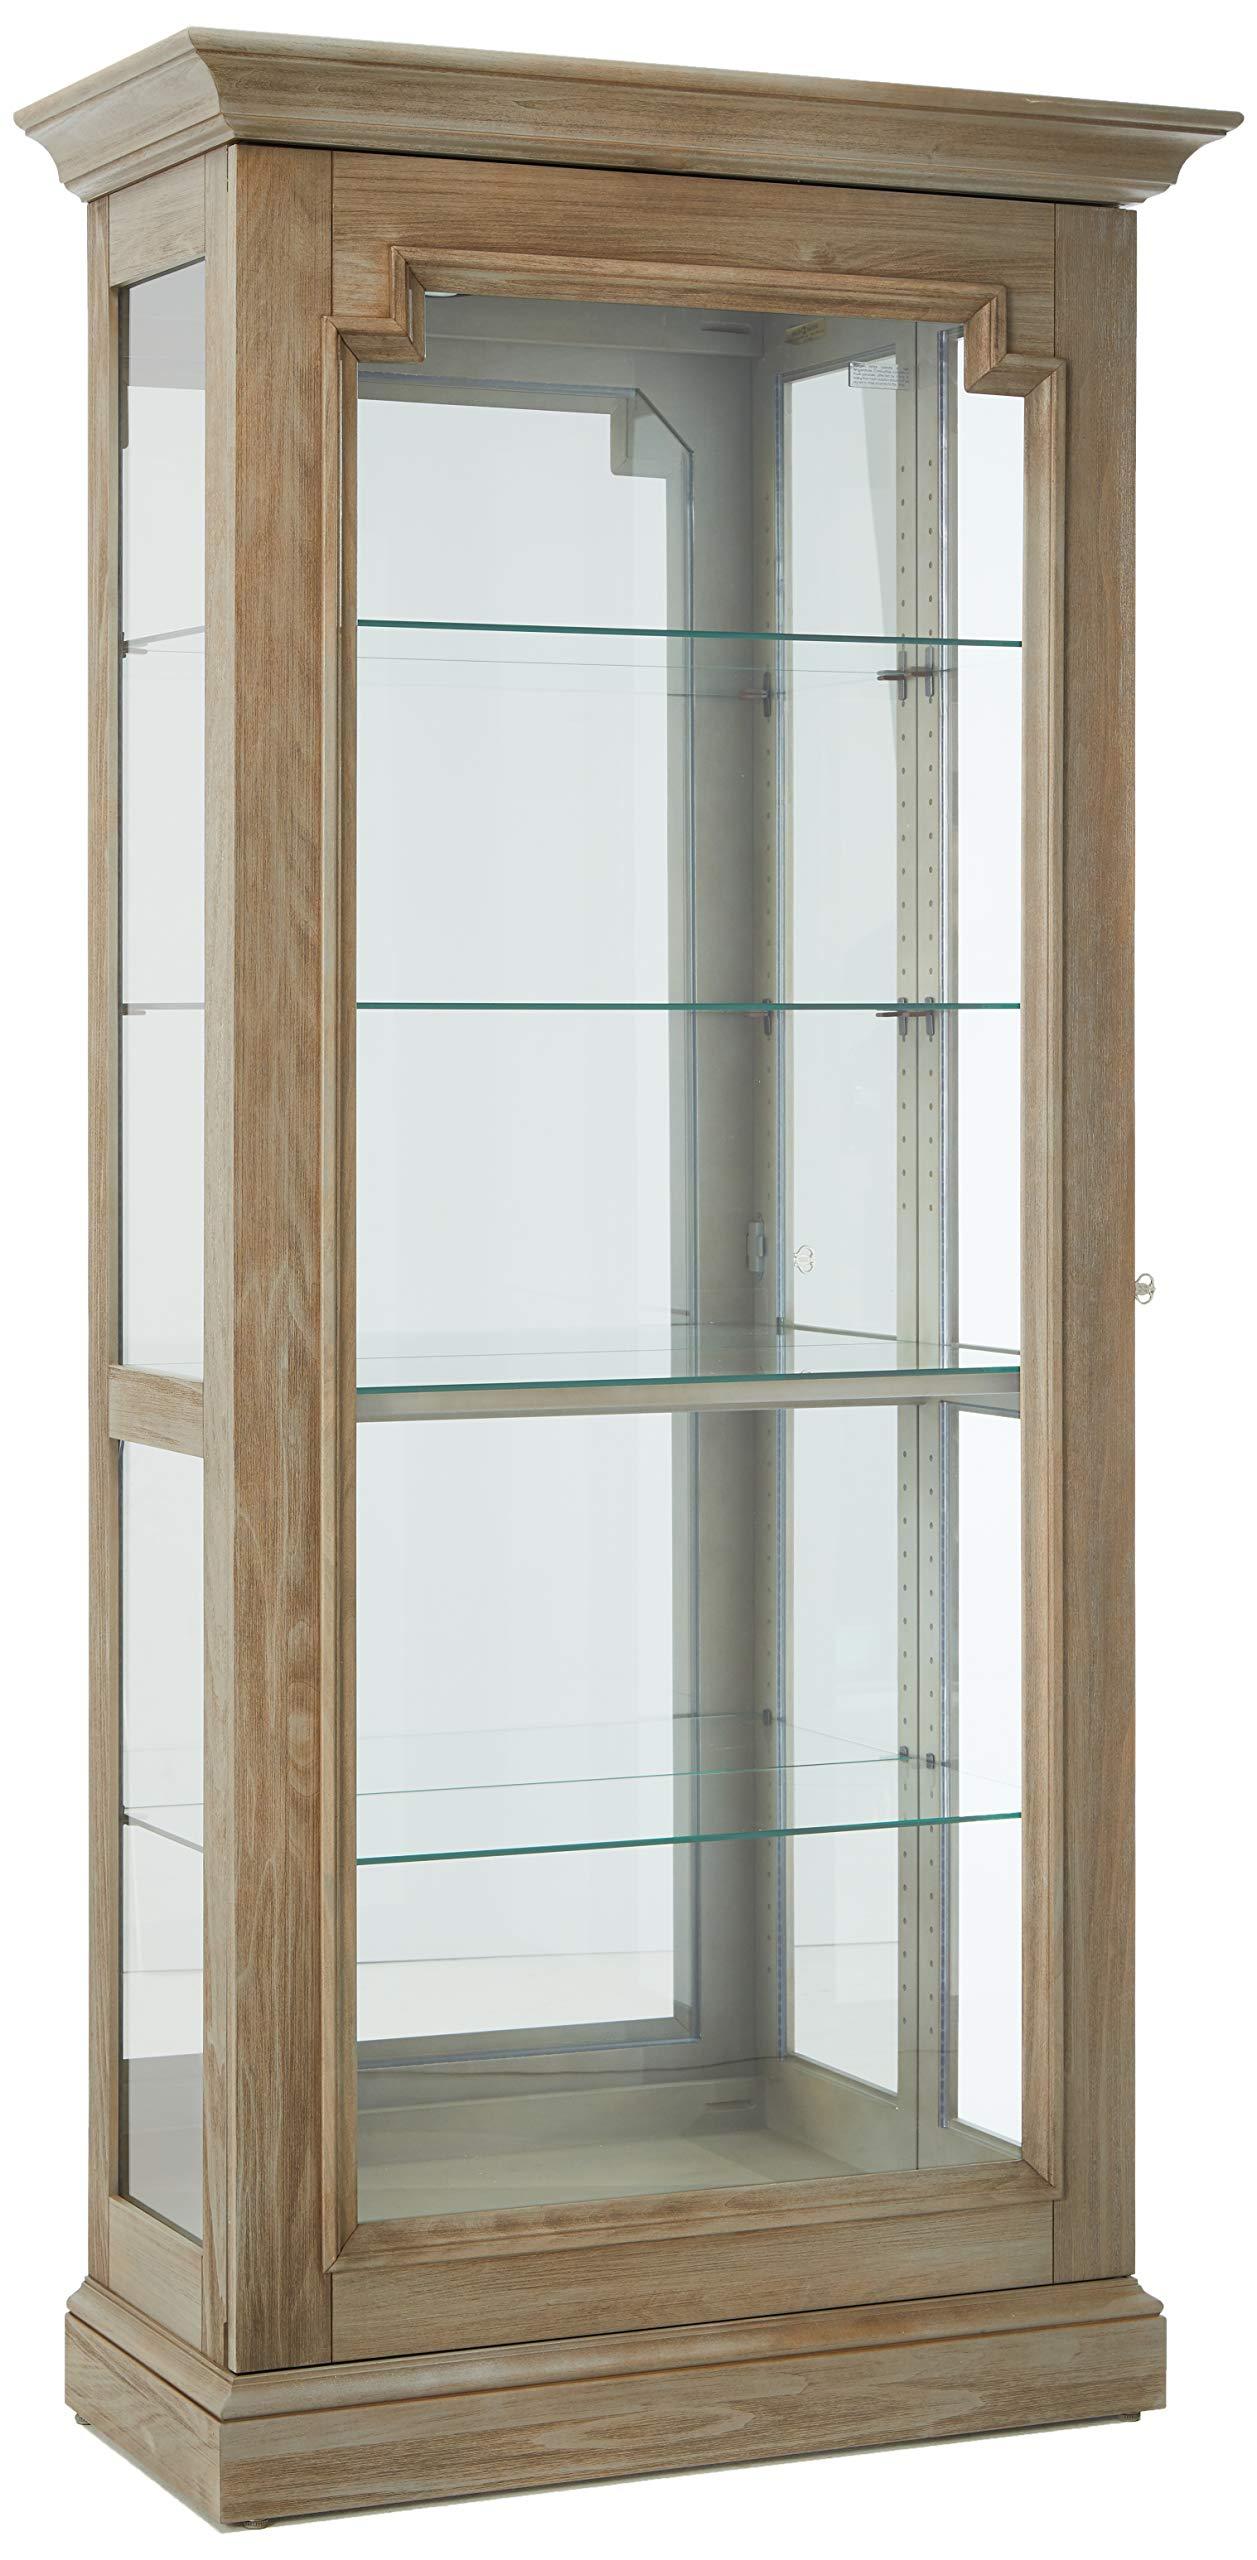 Howard Miller CADEN III Curio Cabinet, Aged Gray by Howard Miller